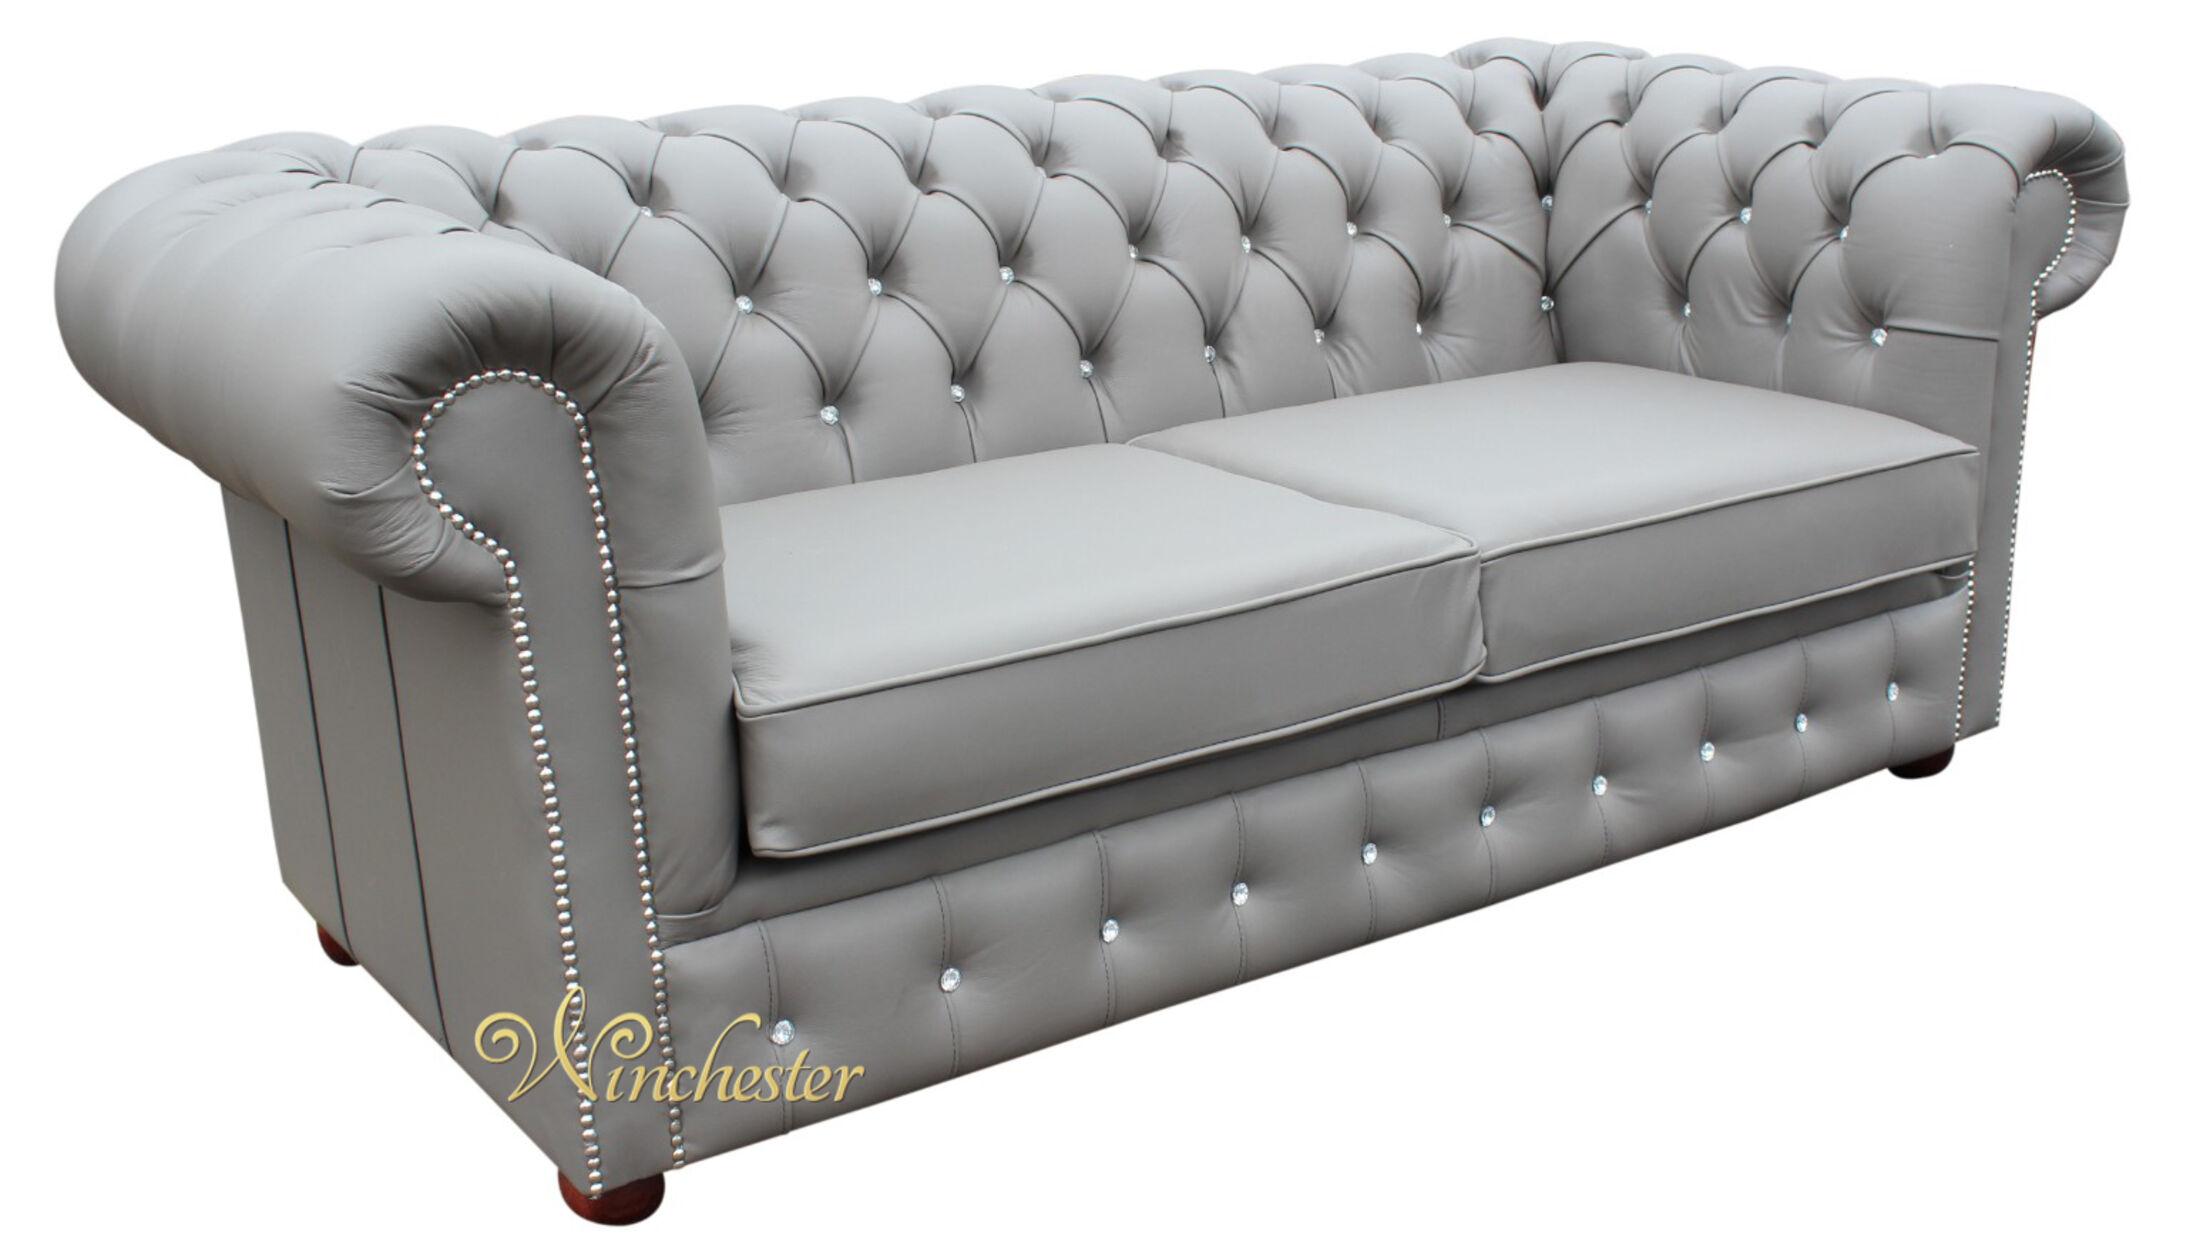 Chesterfield 2 Seater Sofa Bed Swarovski Crystallized Diamond Moon Mist Leather Offer